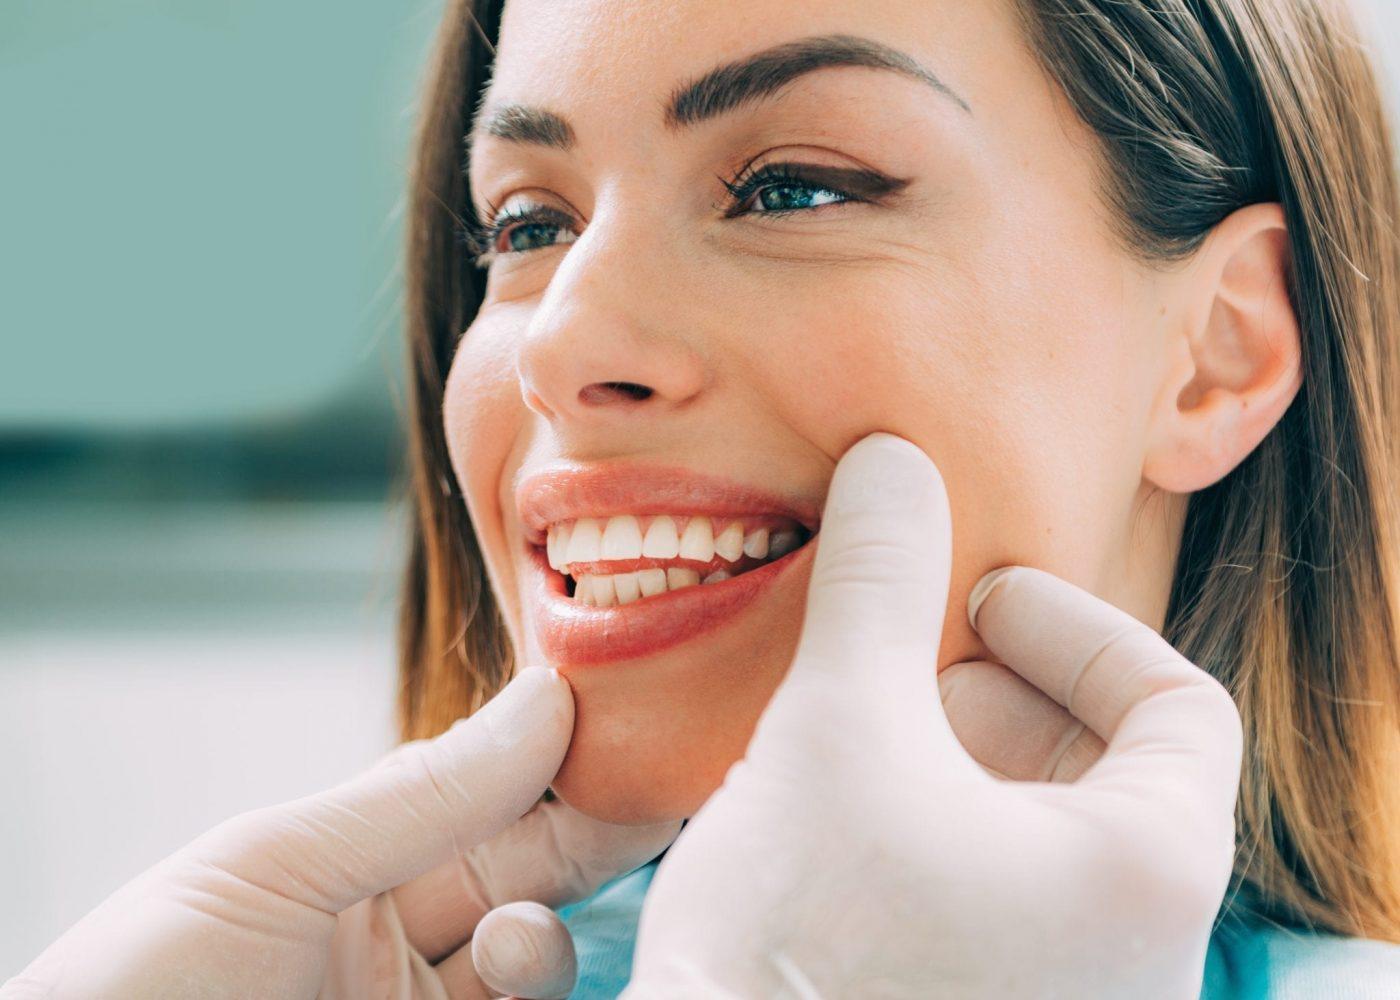 dentist-with-beautiful-female-patient-B5M9X2W.jpg